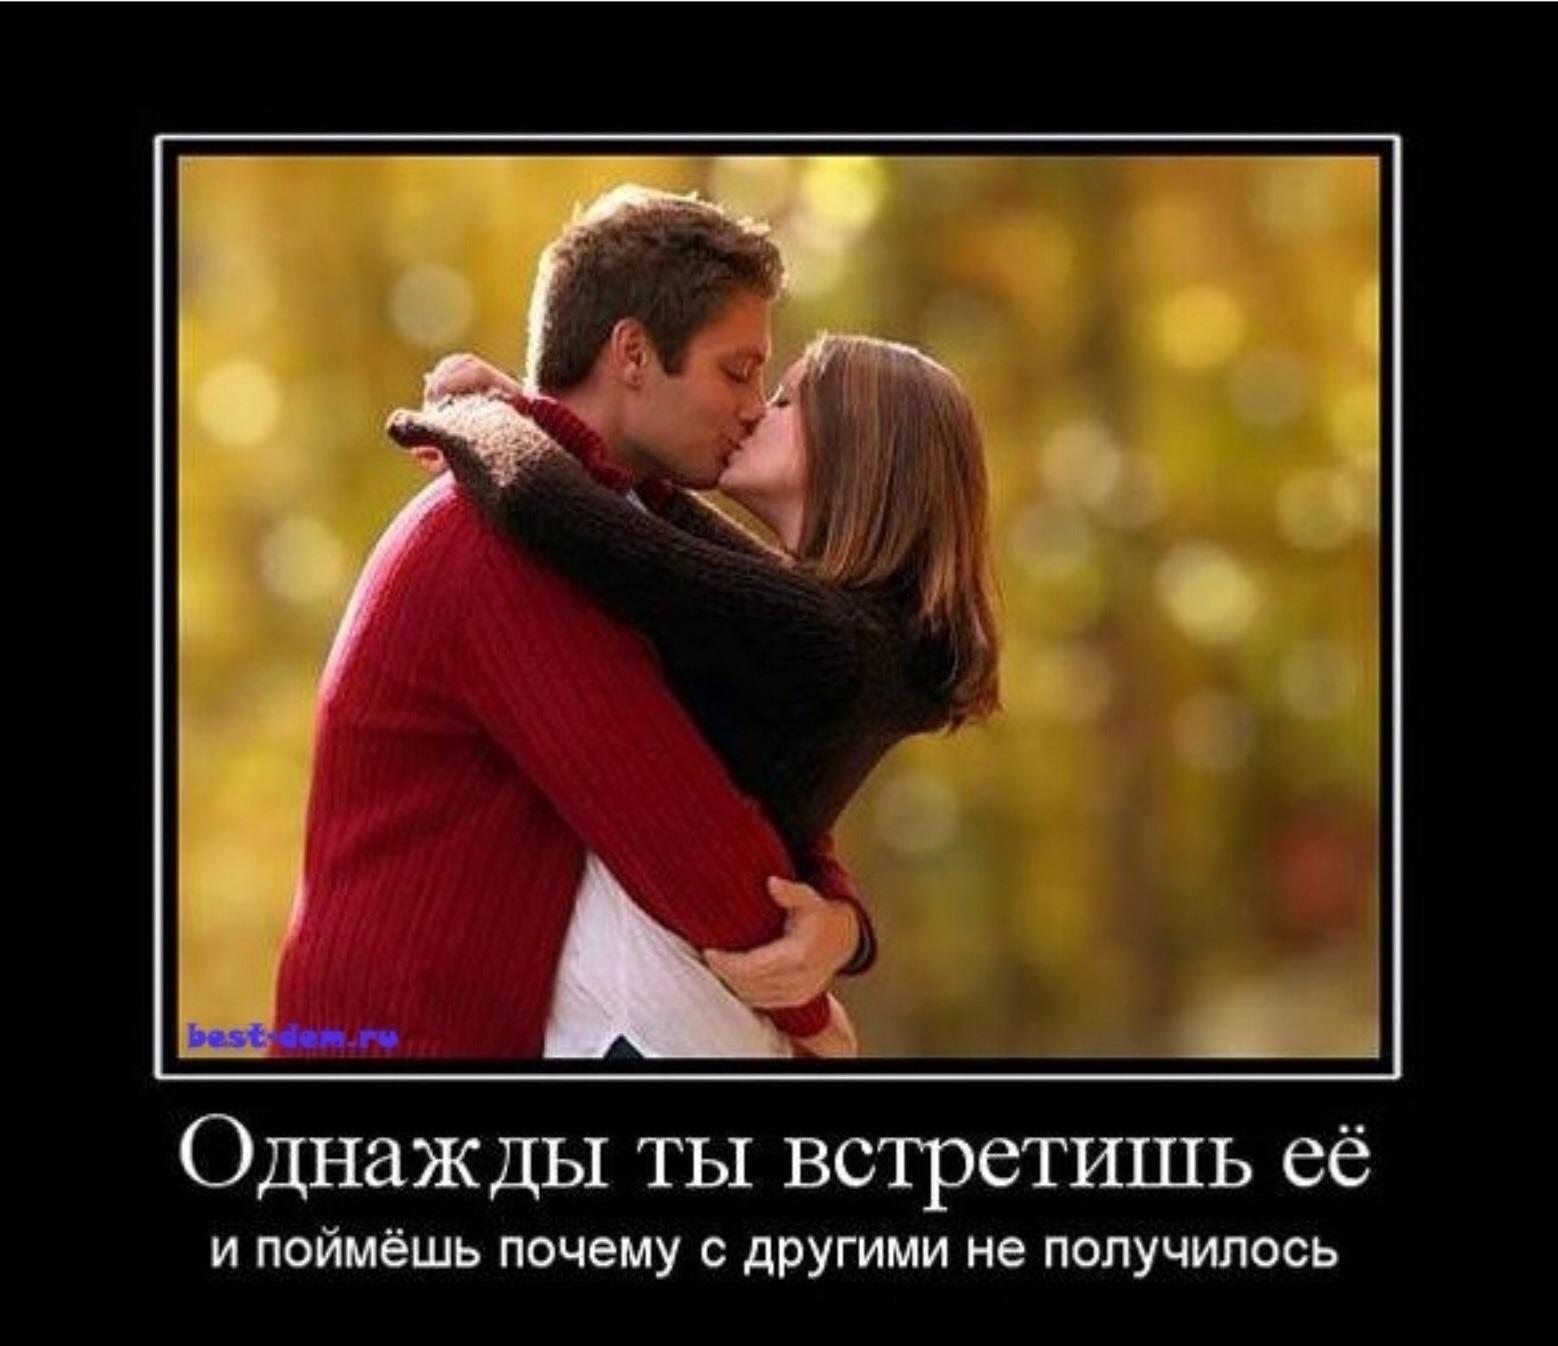 http://otvet.imgsmail.ru/download/6c11bb6c89b7b435670540b205db9859_h-105.jpg